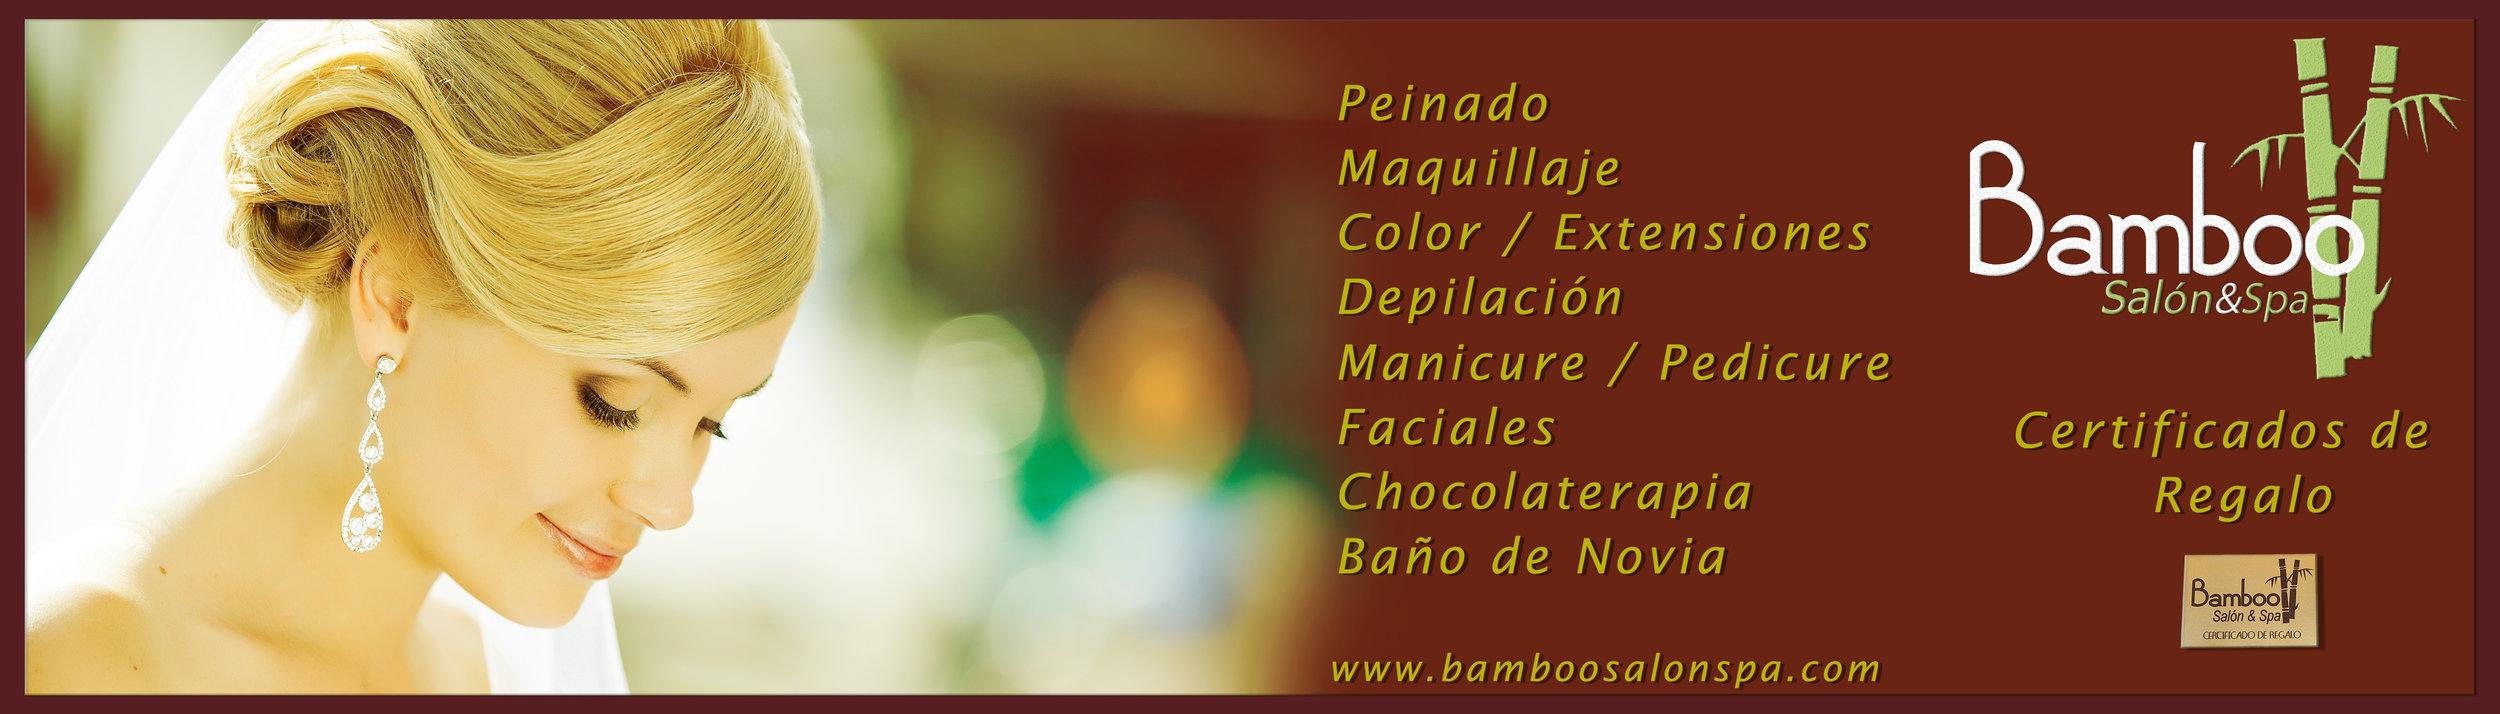 Lona 2 Bamboo 2015.jpg